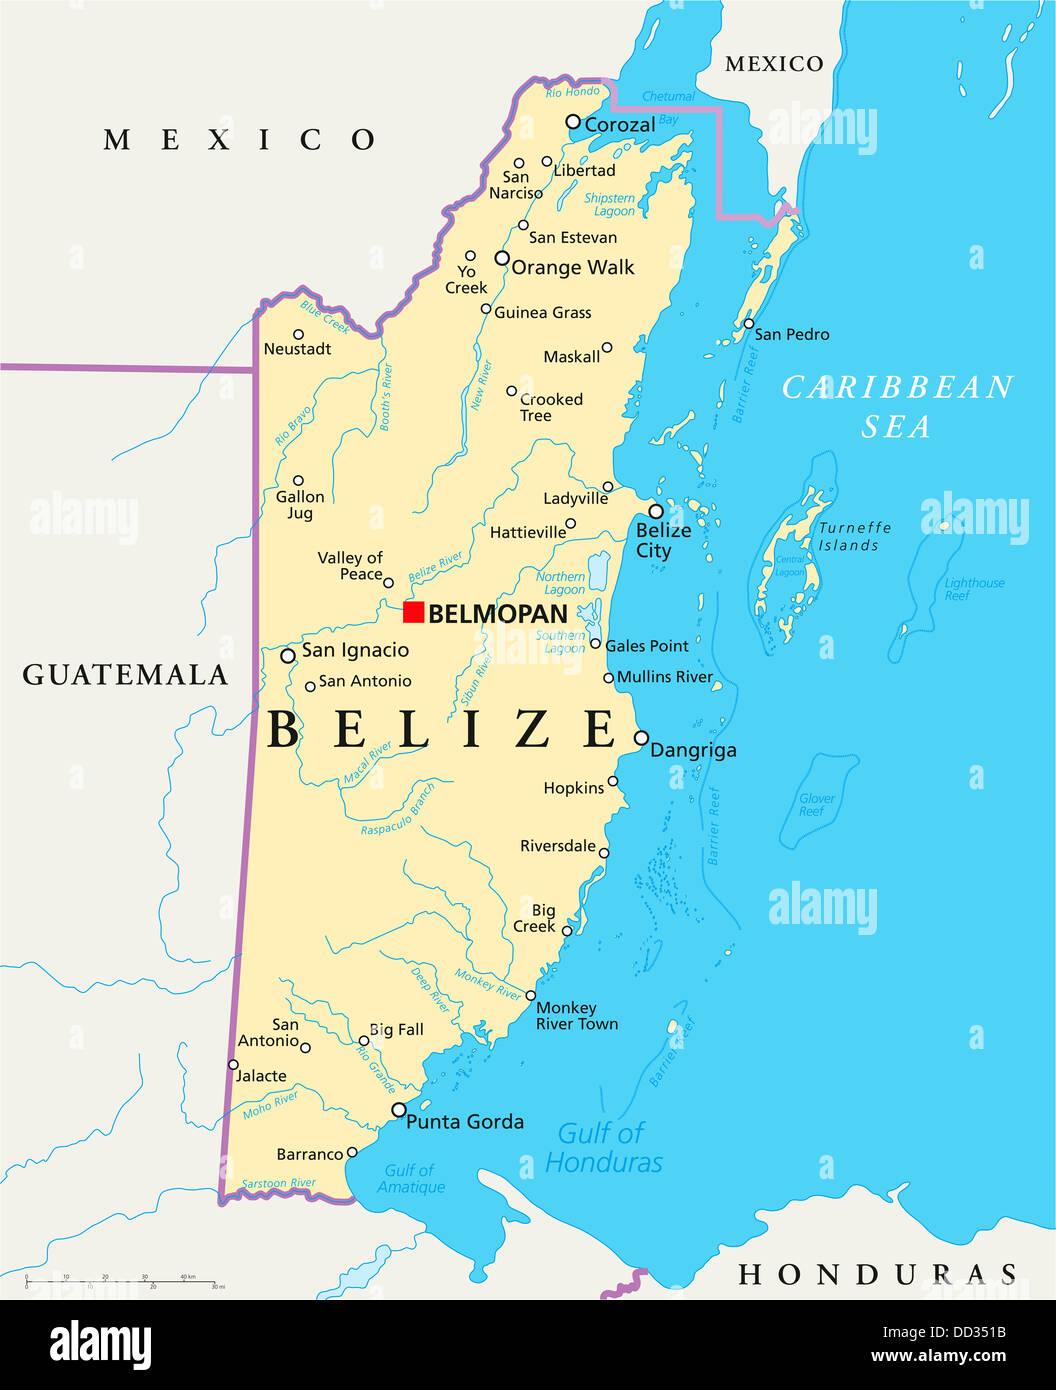 Political Map Of Belize.Political Map Of Belize With Capital Belmopan National Borders